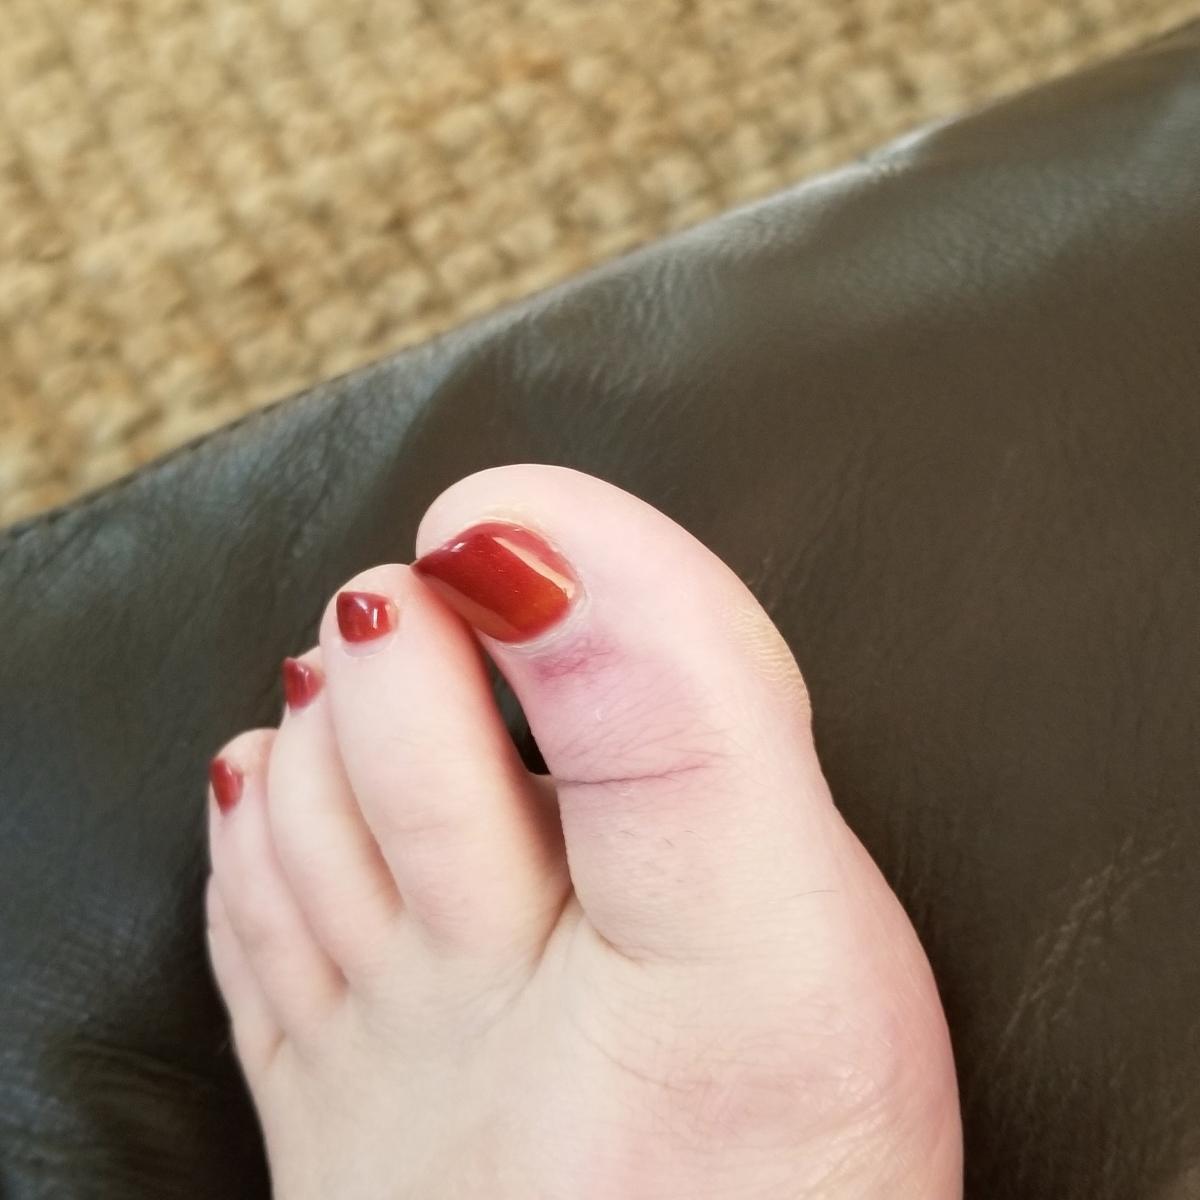 Wicked Toe Injury